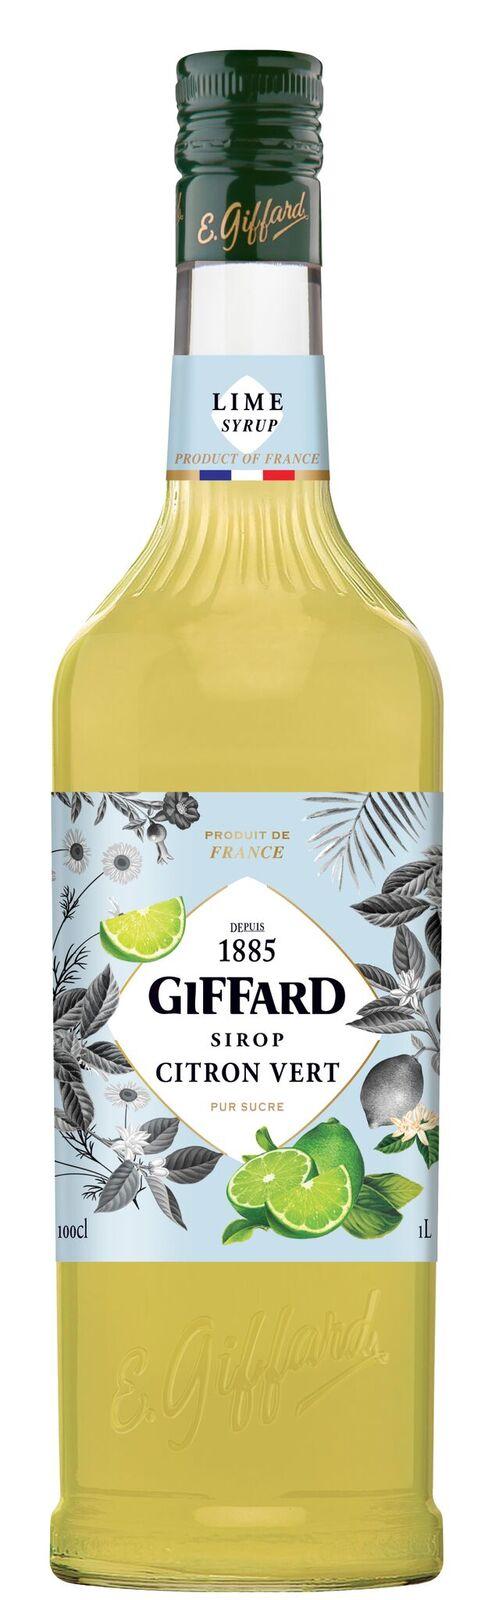 Giffard (sirupy, likéry) Giffard Lime - limetkový sirup 1l